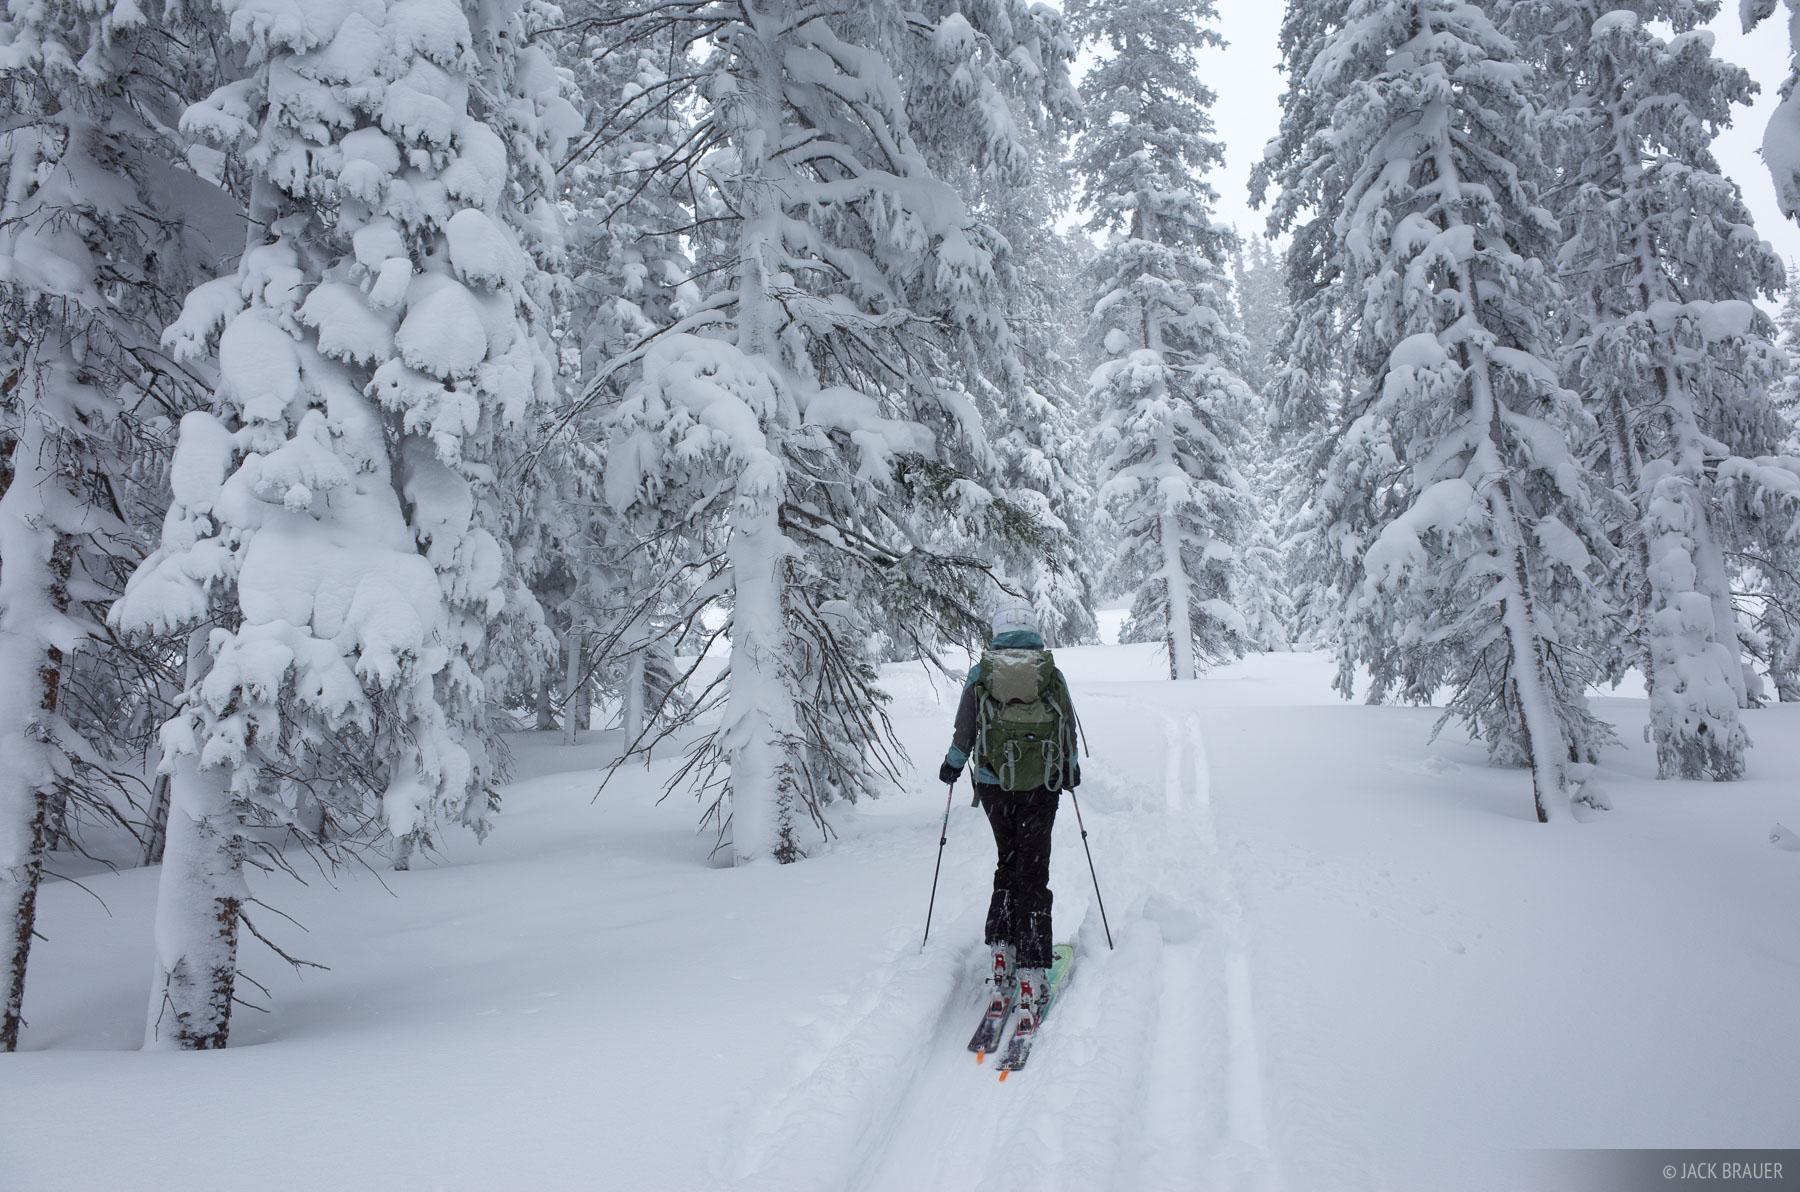 Colorado, Fowler Hilliard, Gore Range, January, skiing, Fowler/Hilliard, winter, active, 2014